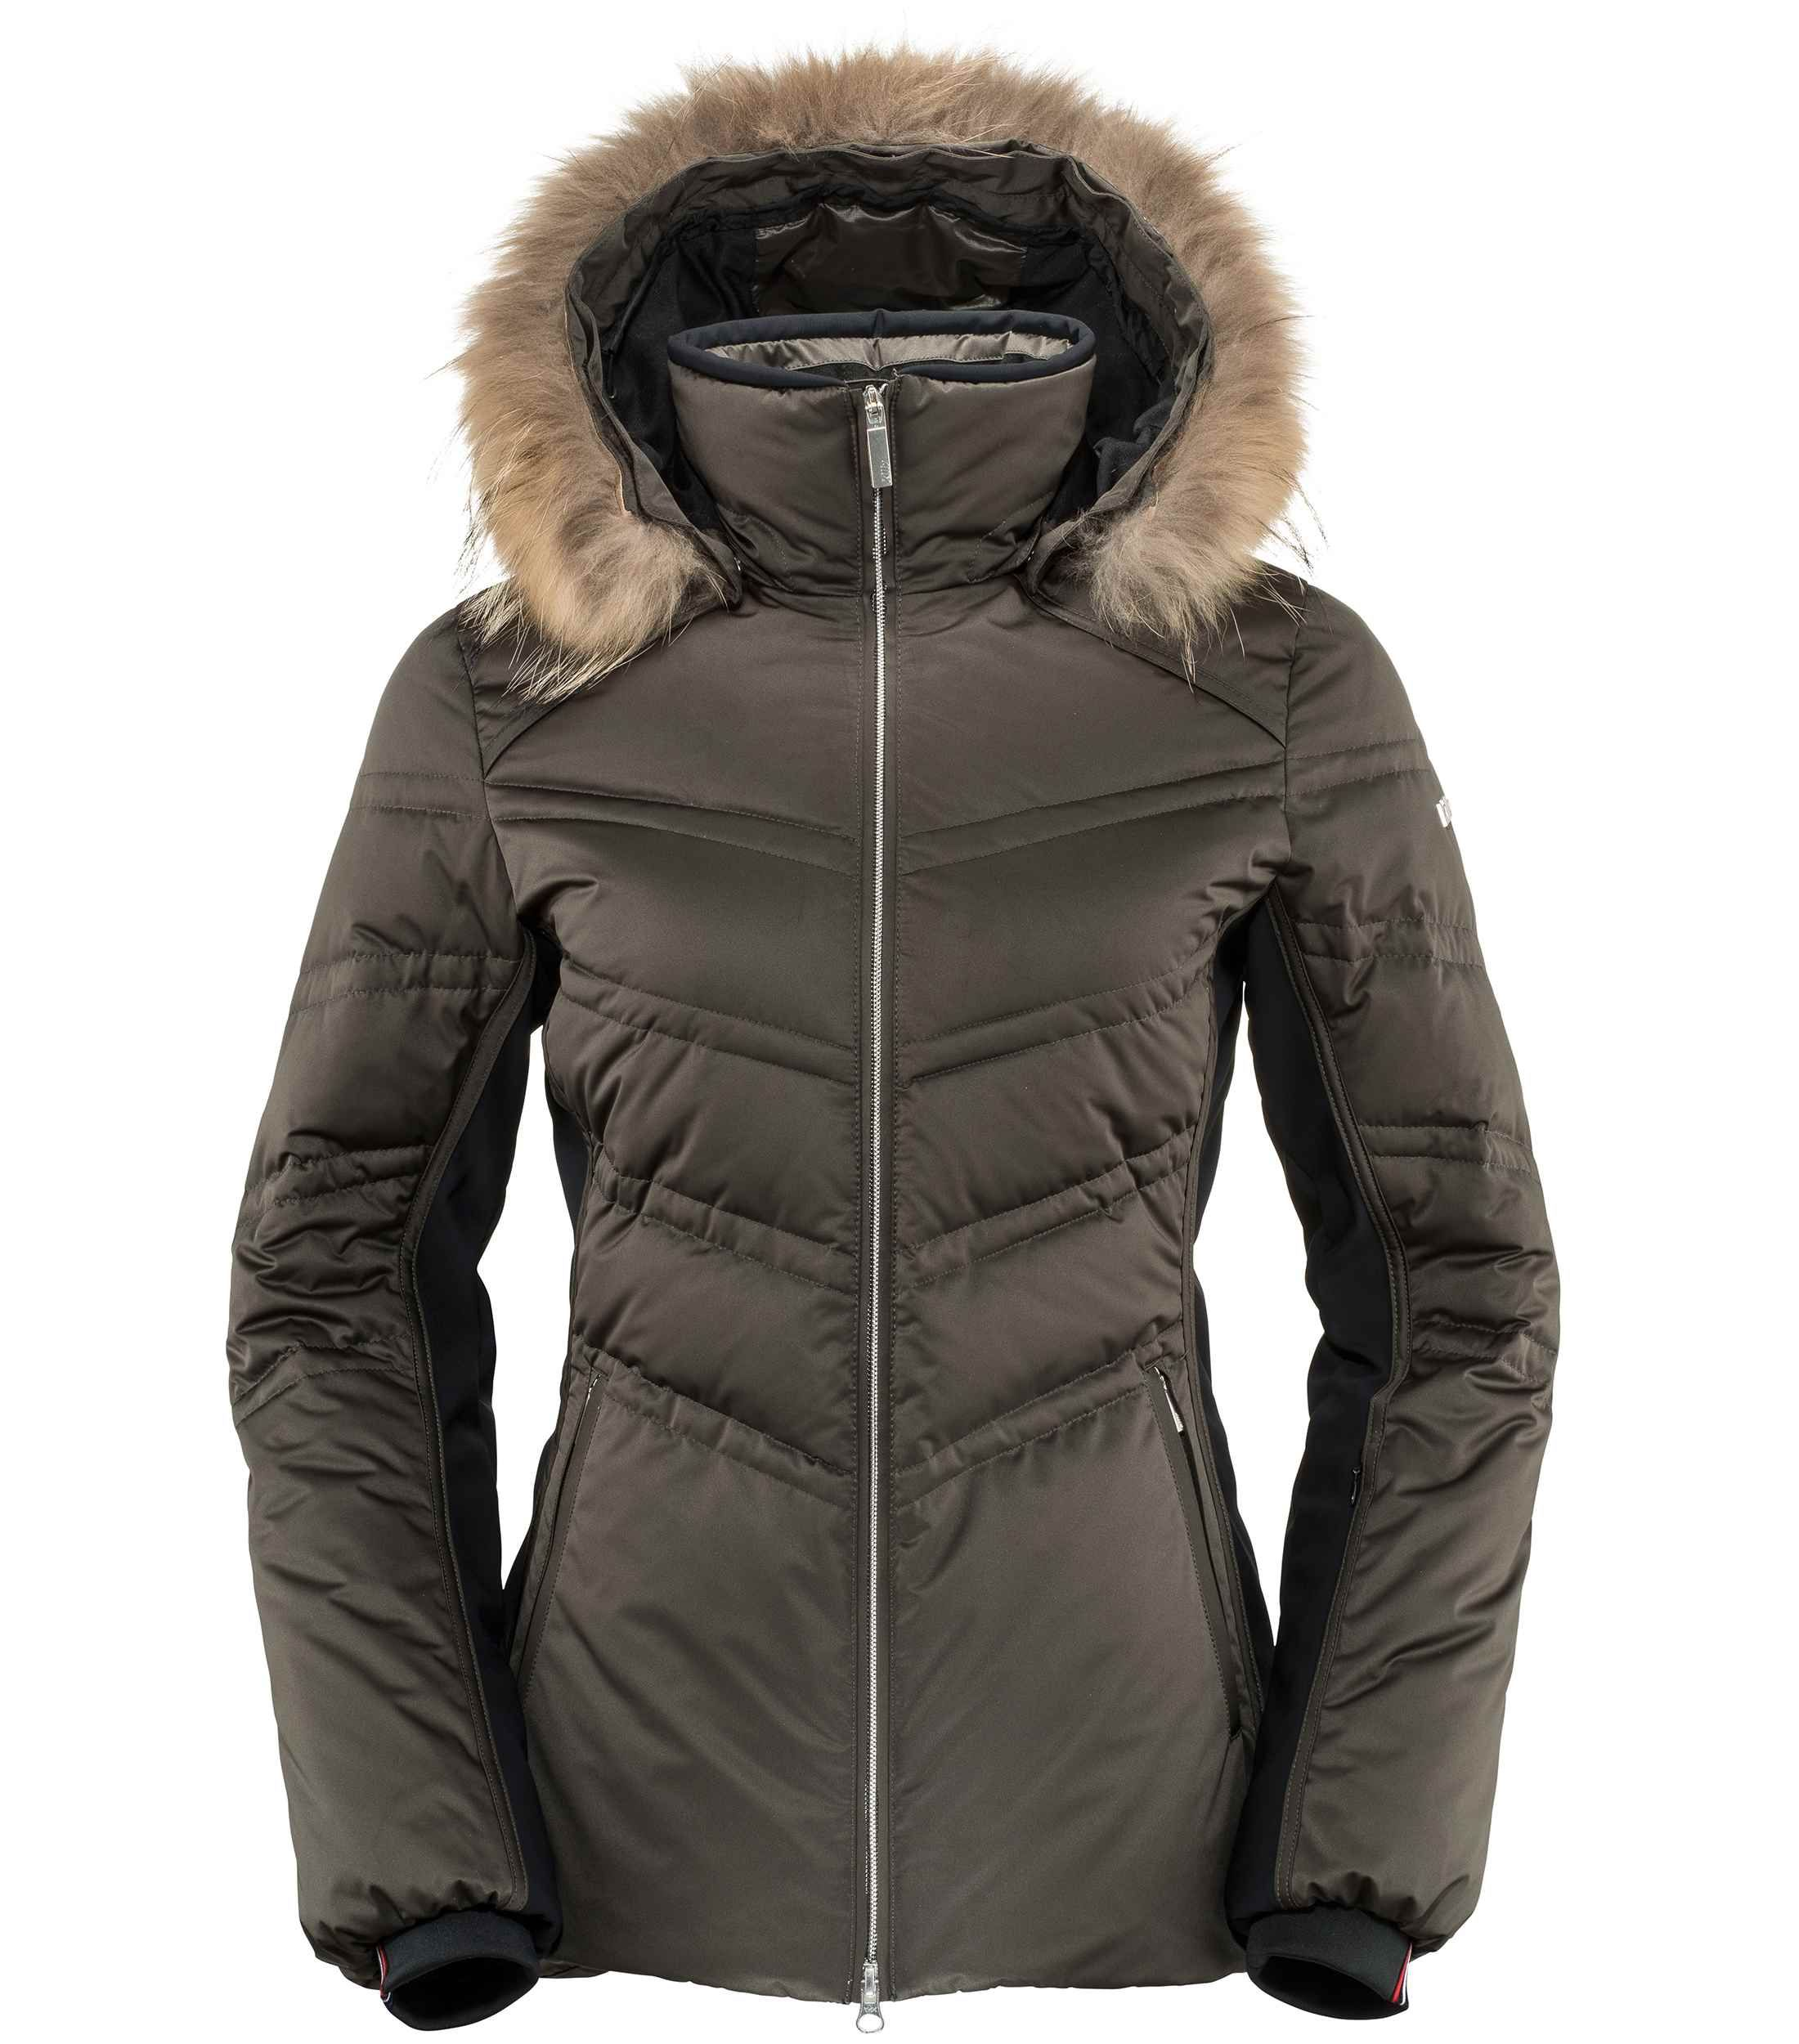 Ourea Killy Jacket